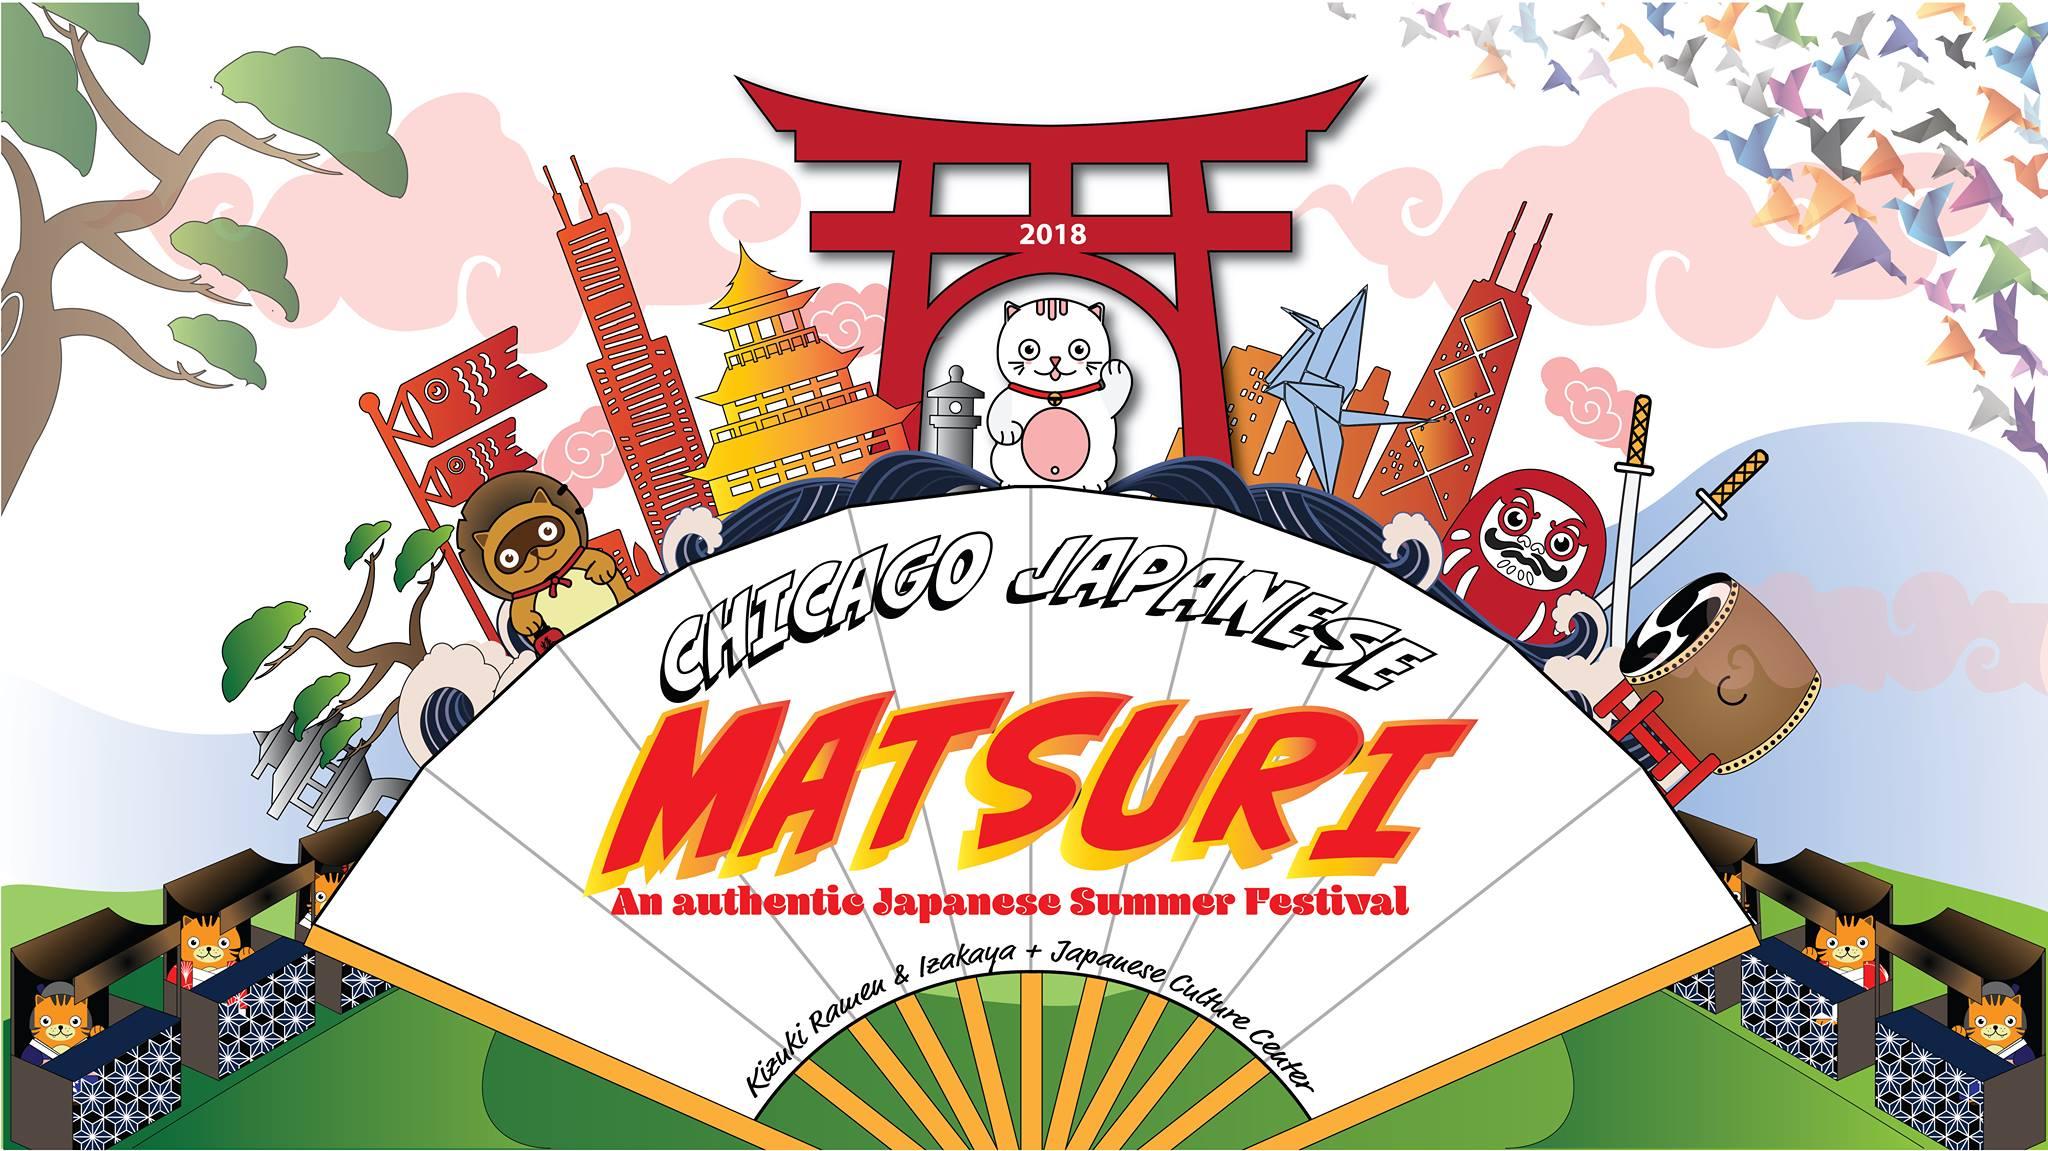 chicago-japanese-matsuri